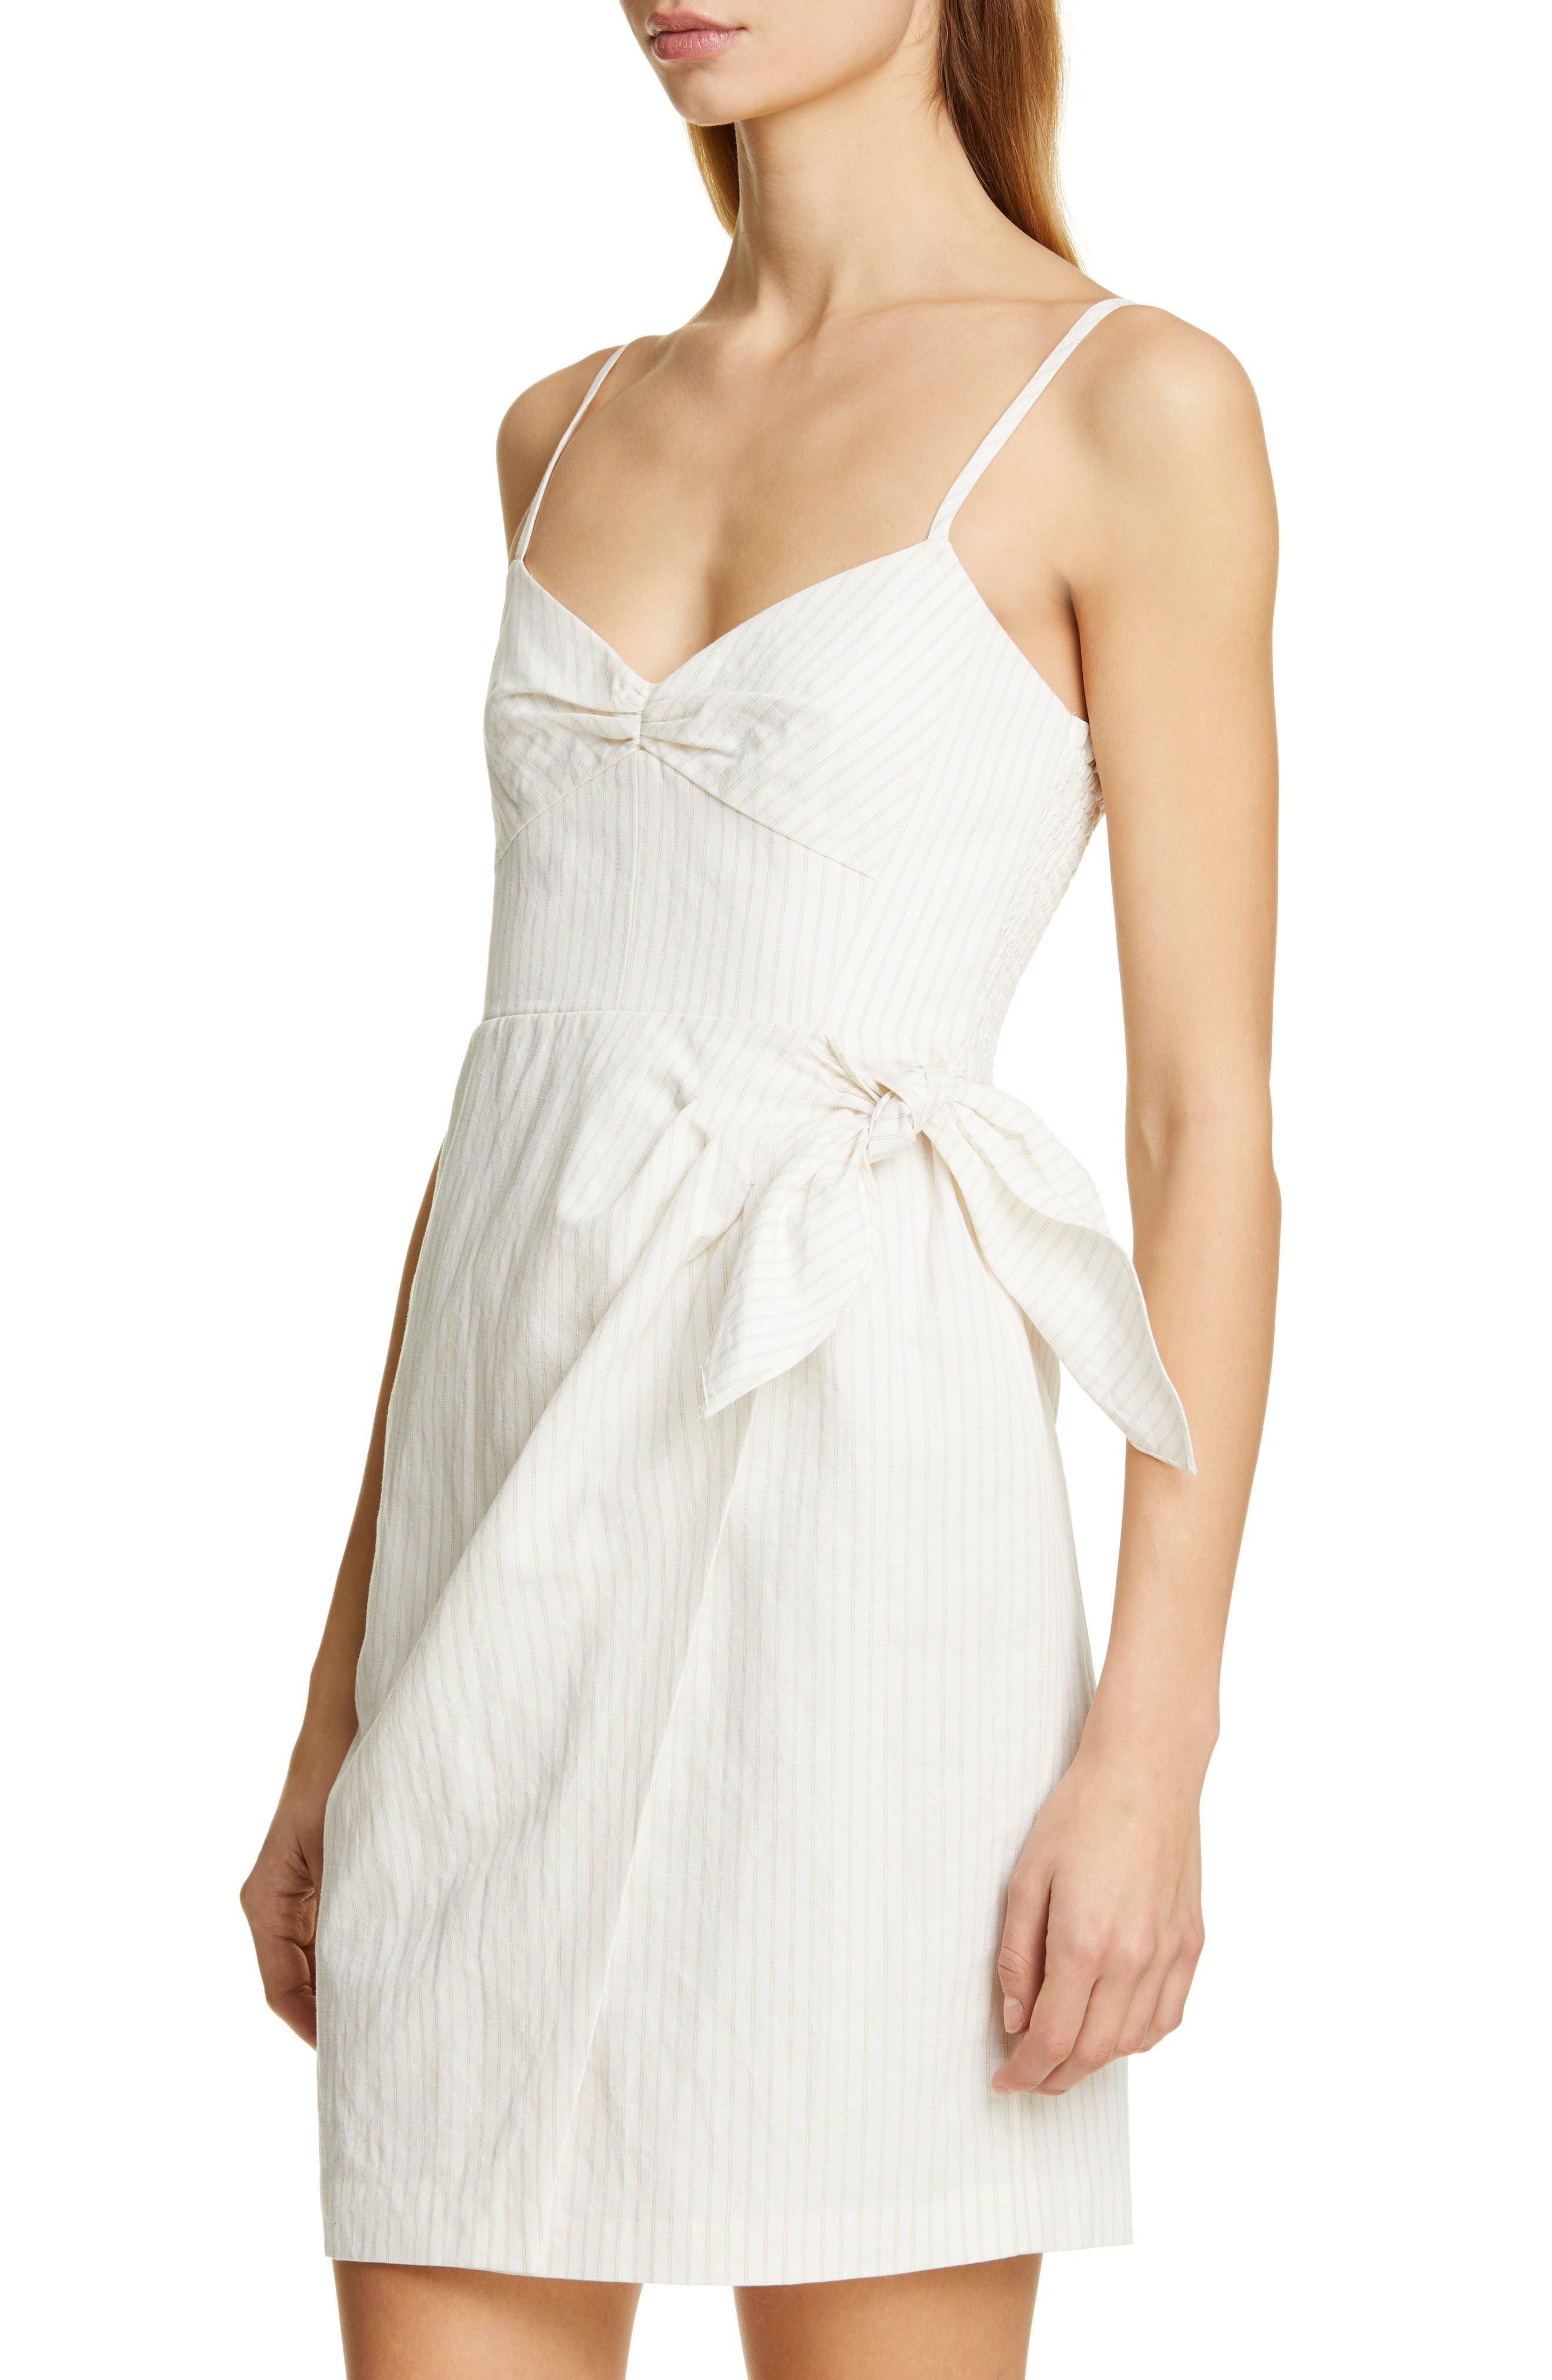 REBECCA TAYLOR, Pinstripe Cotton & Linen Dress, Alternate thumbnail 4, color, SNOW COMBO